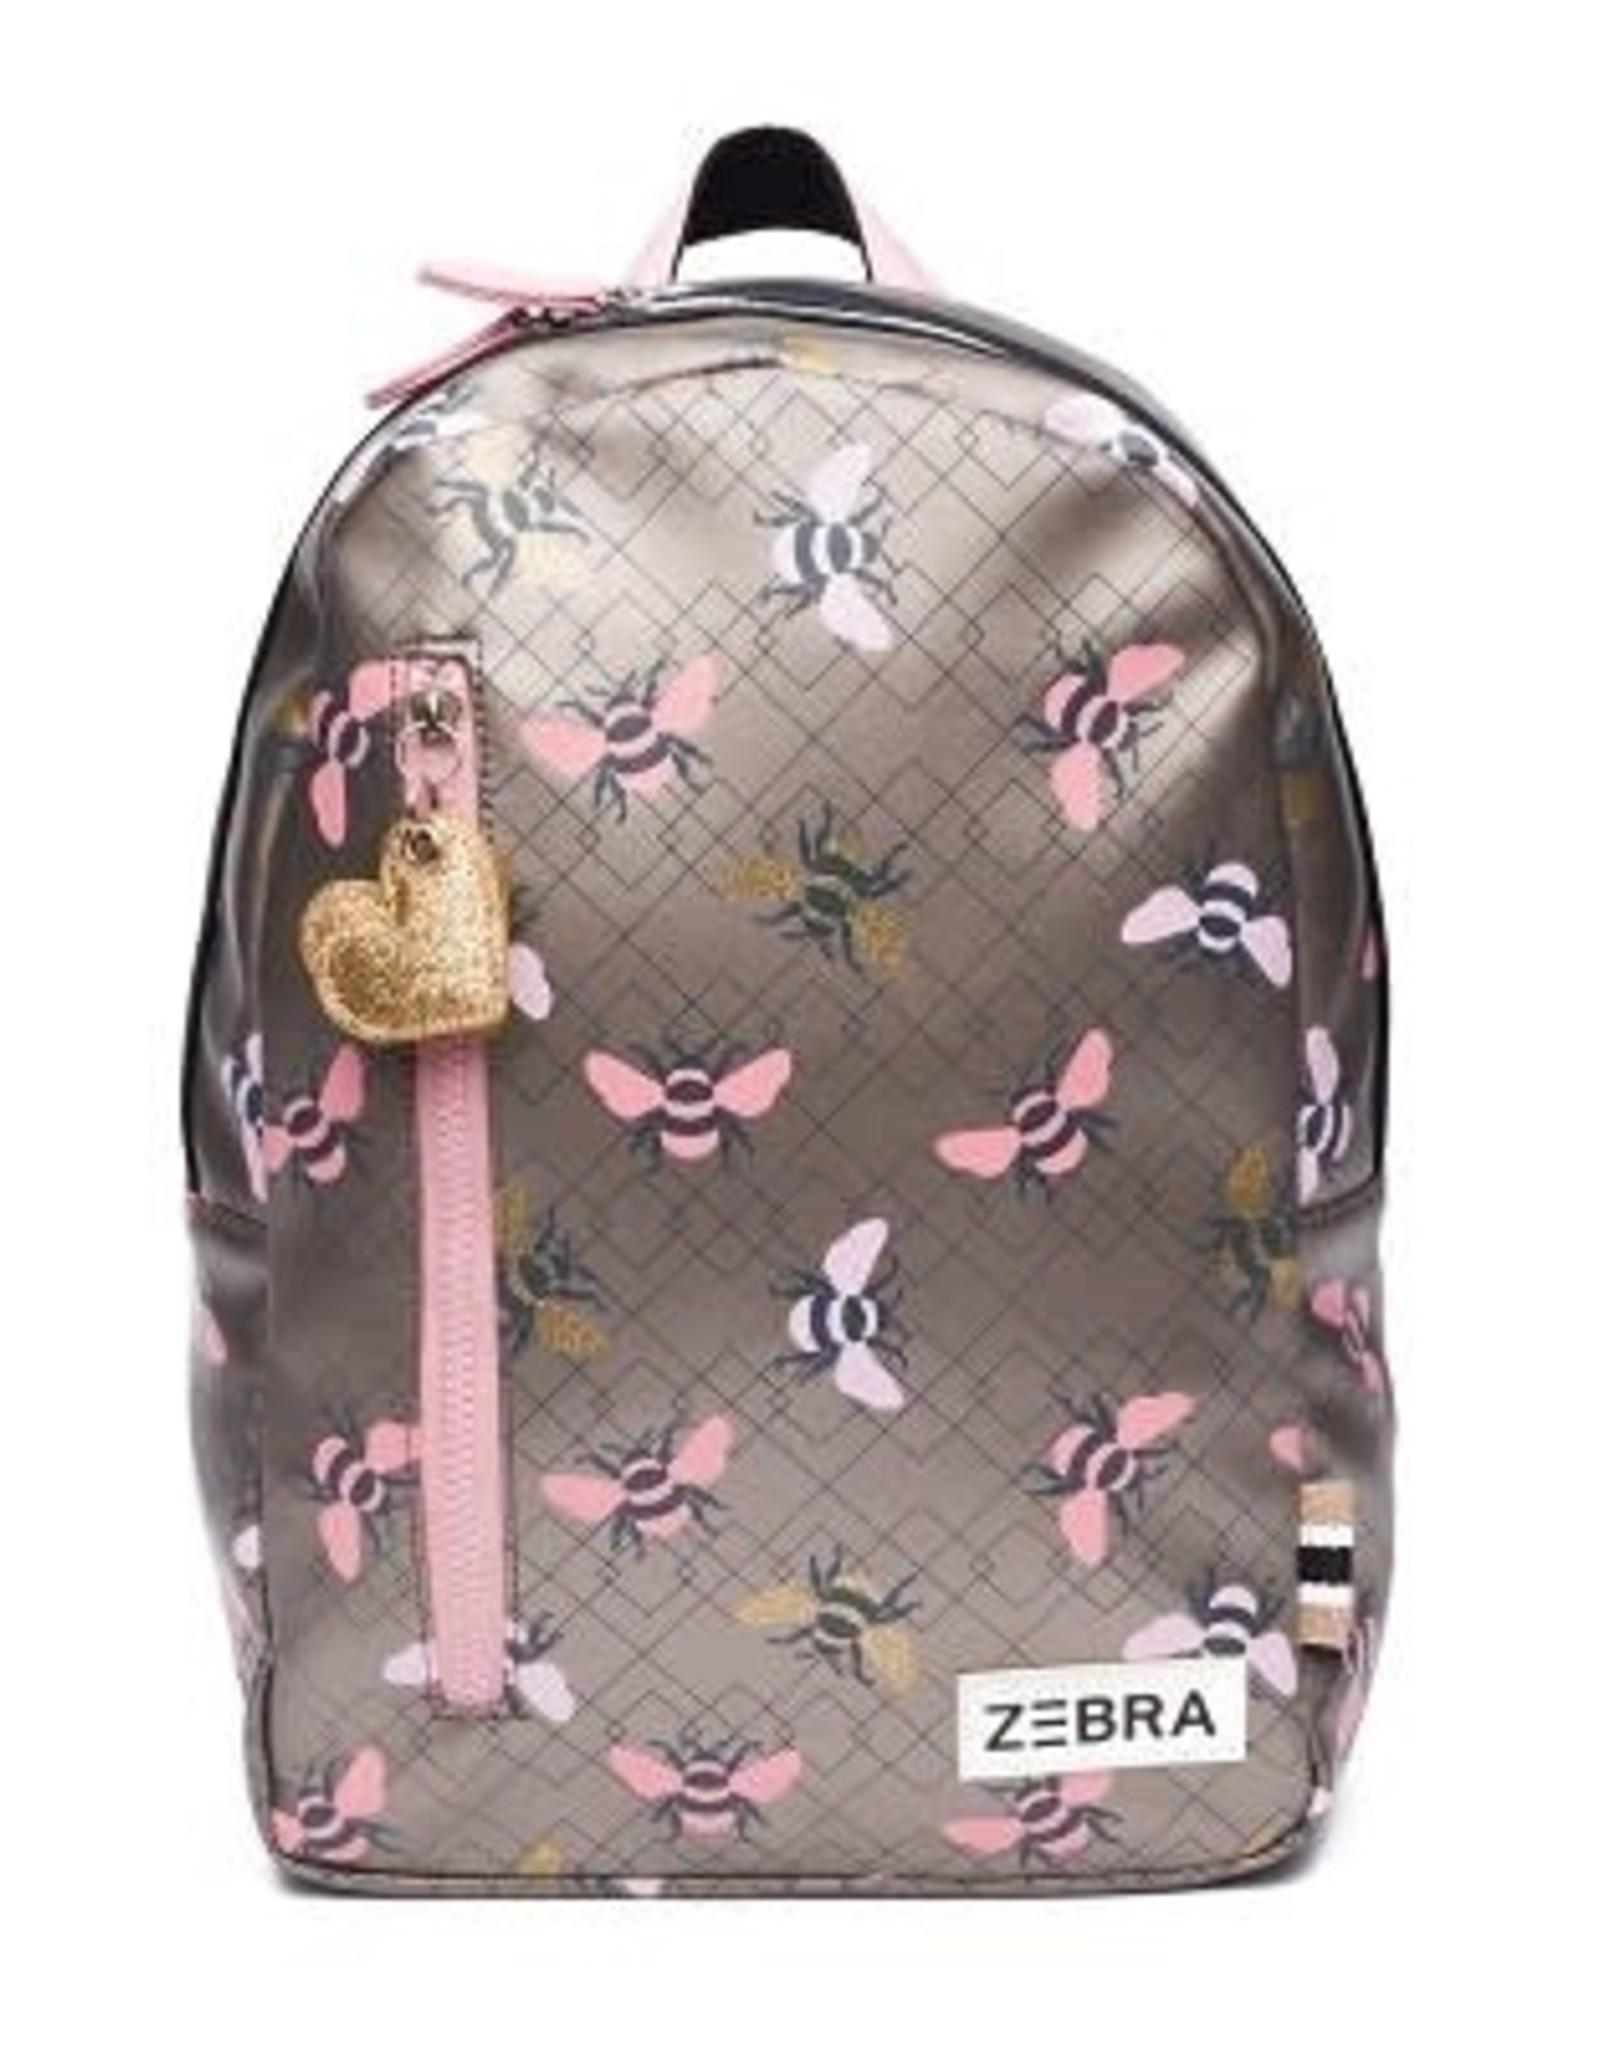 Zebra Trends Rugzak Bees M